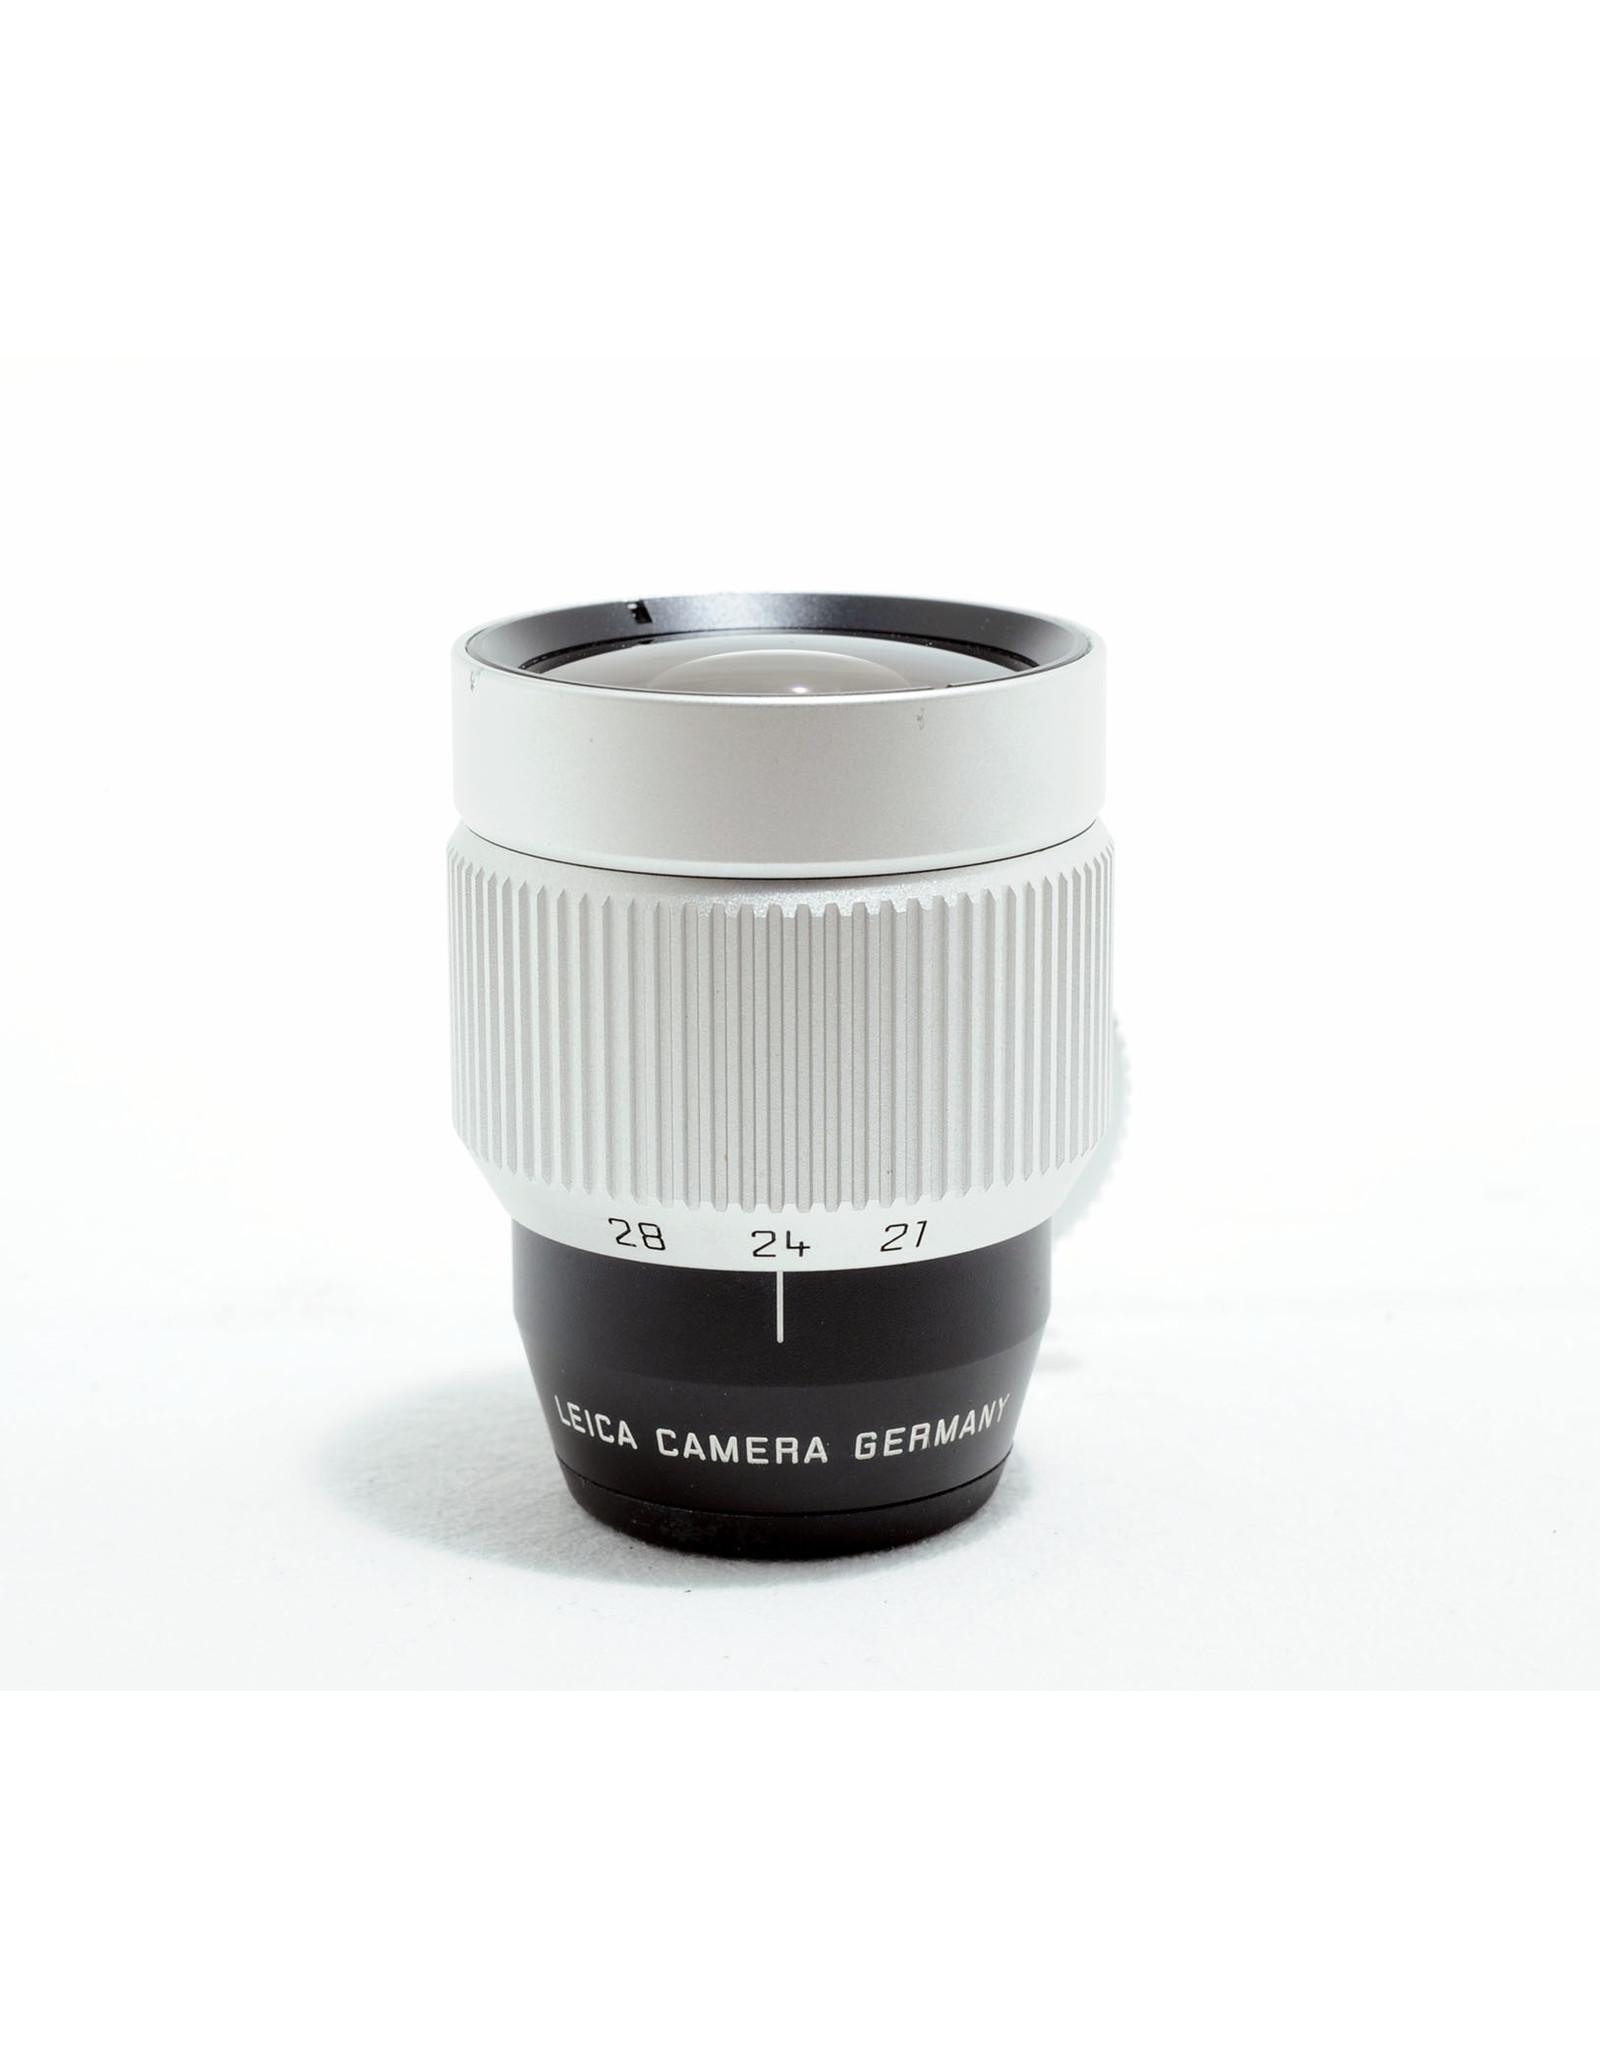 Leica Leica 21-24-28mm Multi Finder Silver   4